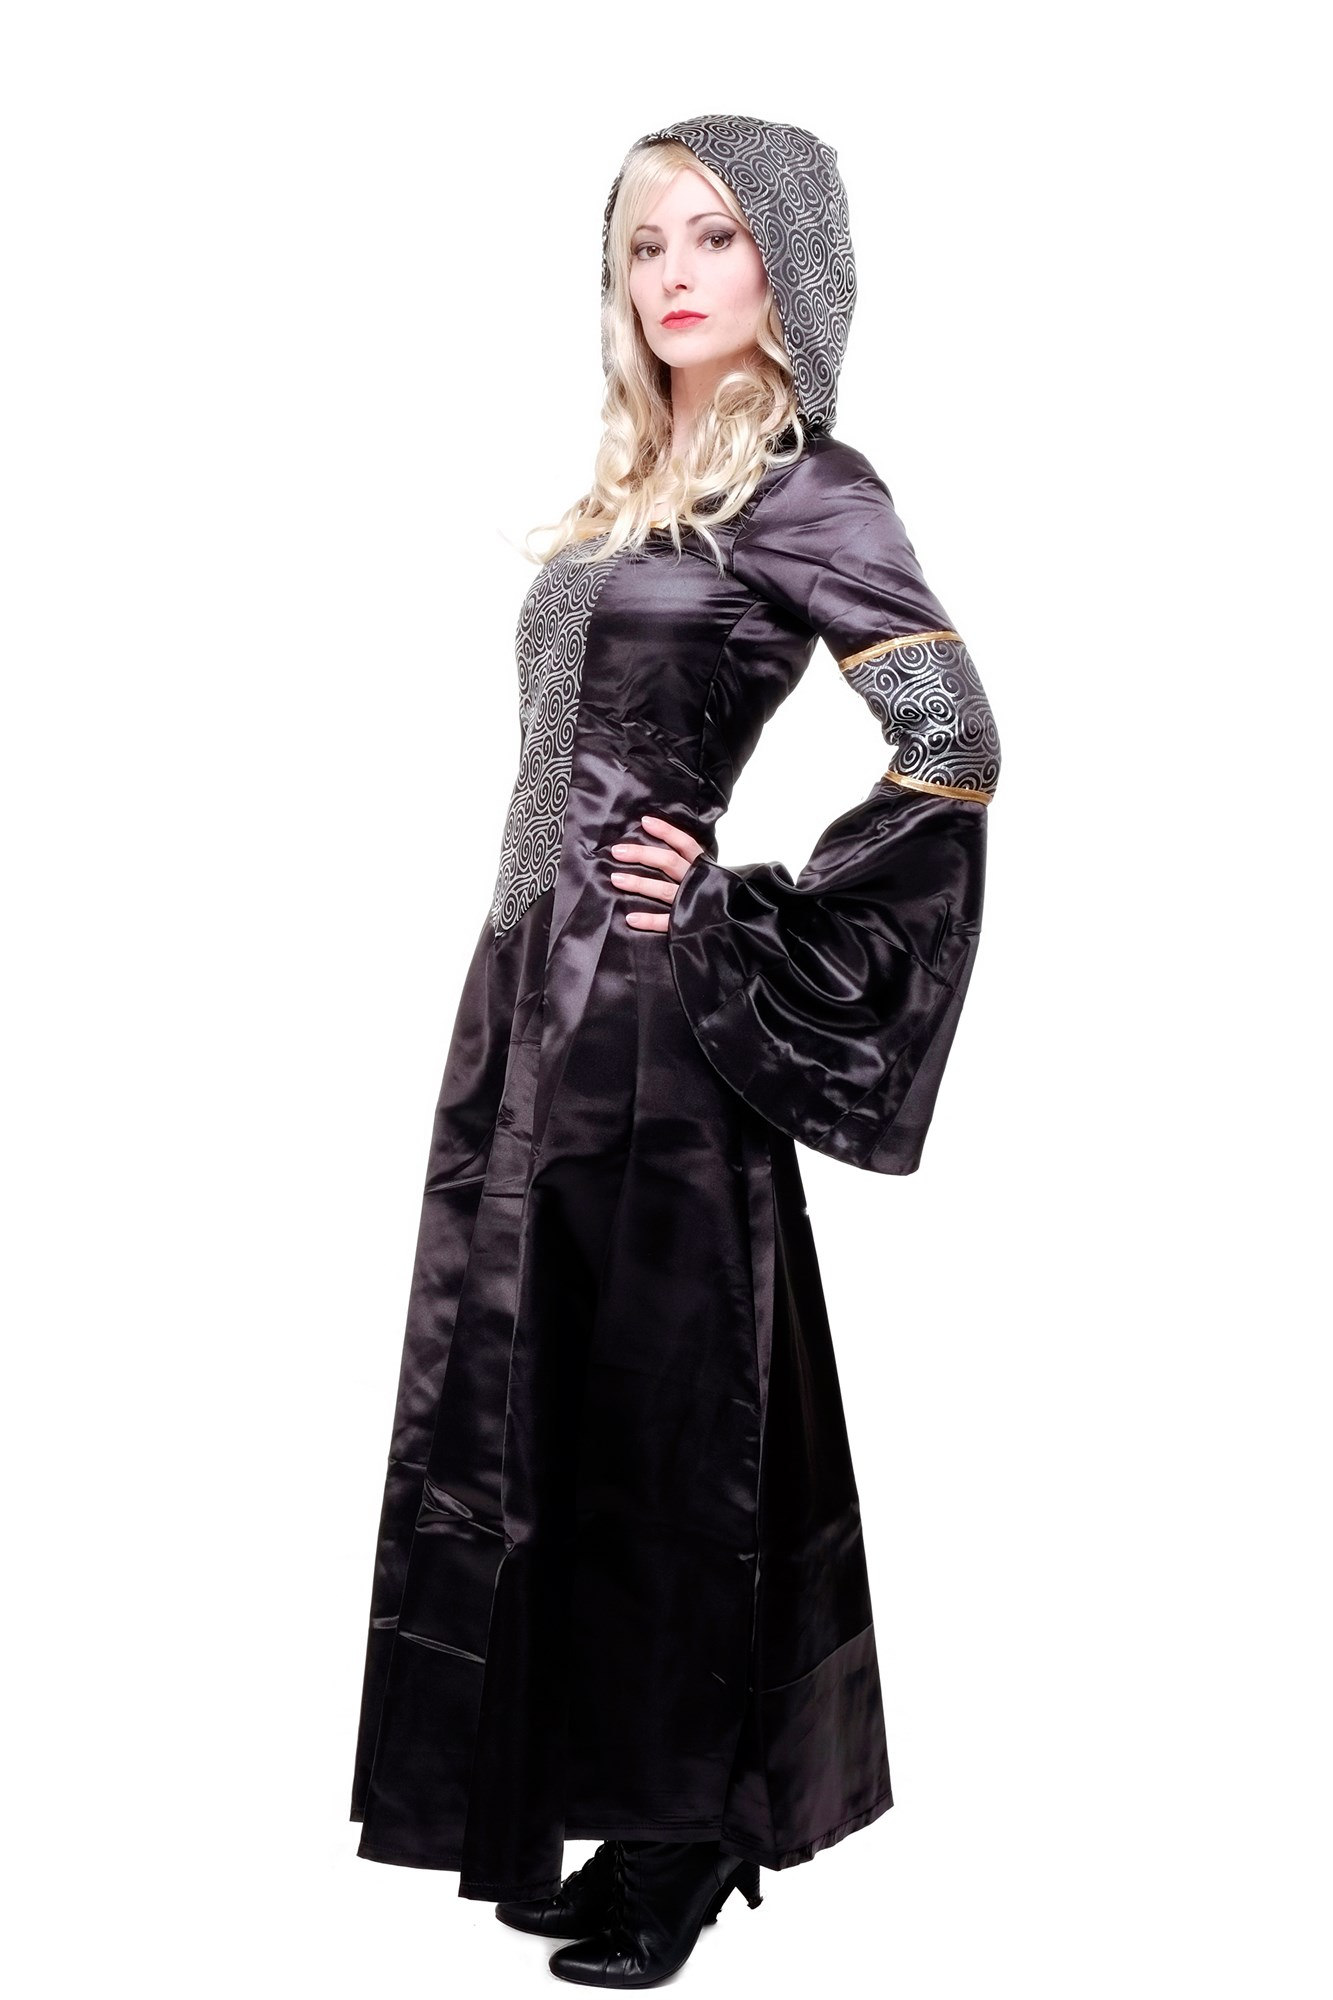 kostüme & verkleidungen edles aufwändiges damen kostüm